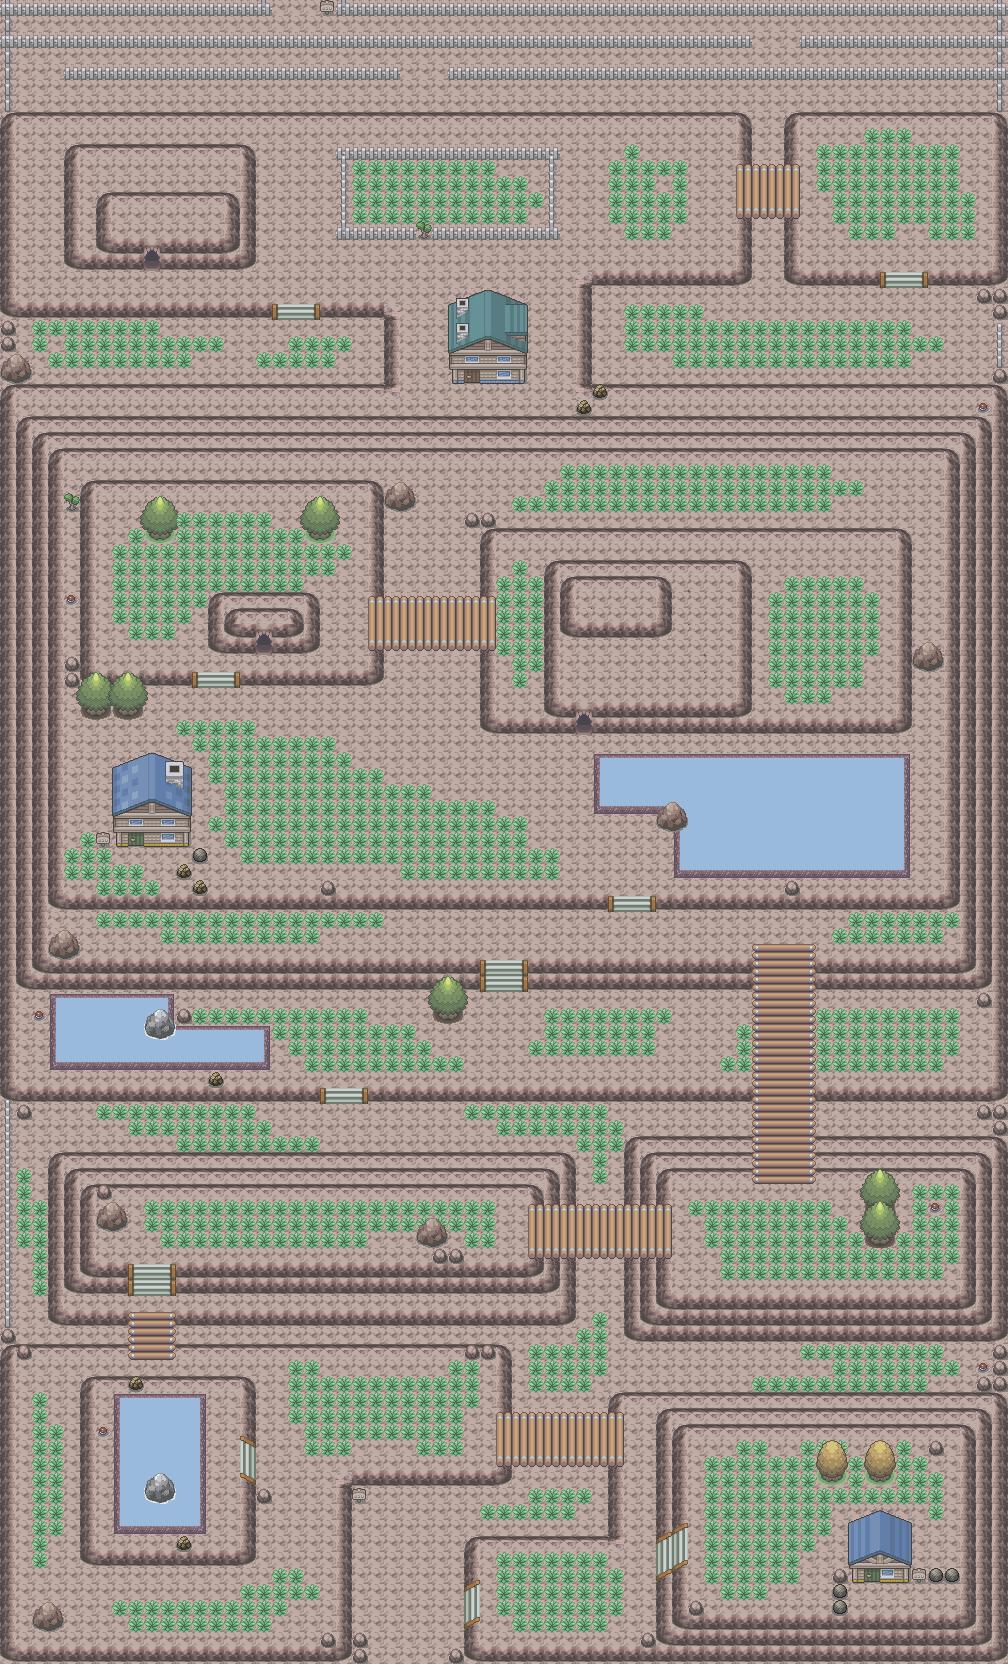 Pokémon-Map: Bergroute II